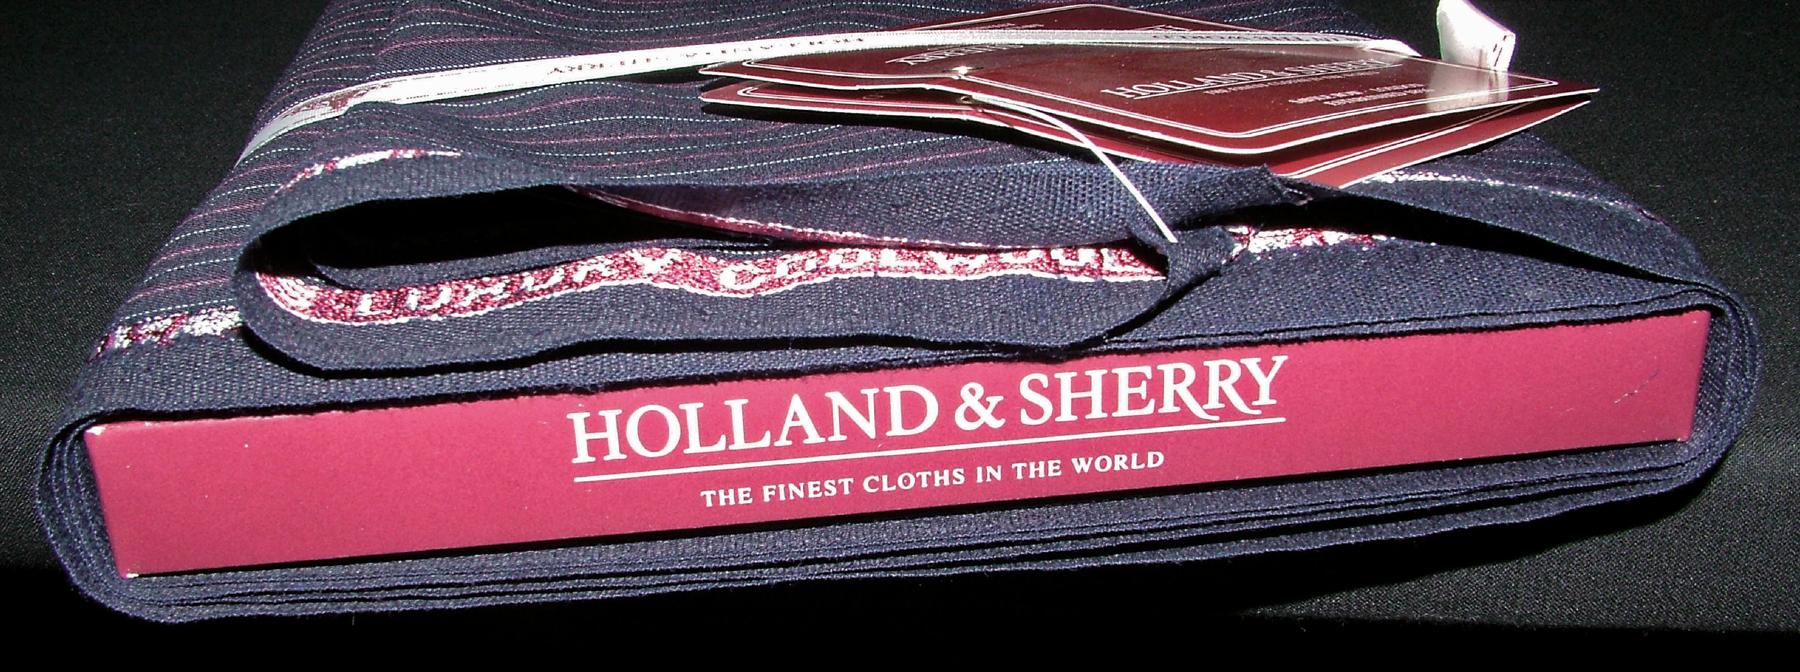 Holland & Sherry fabrics